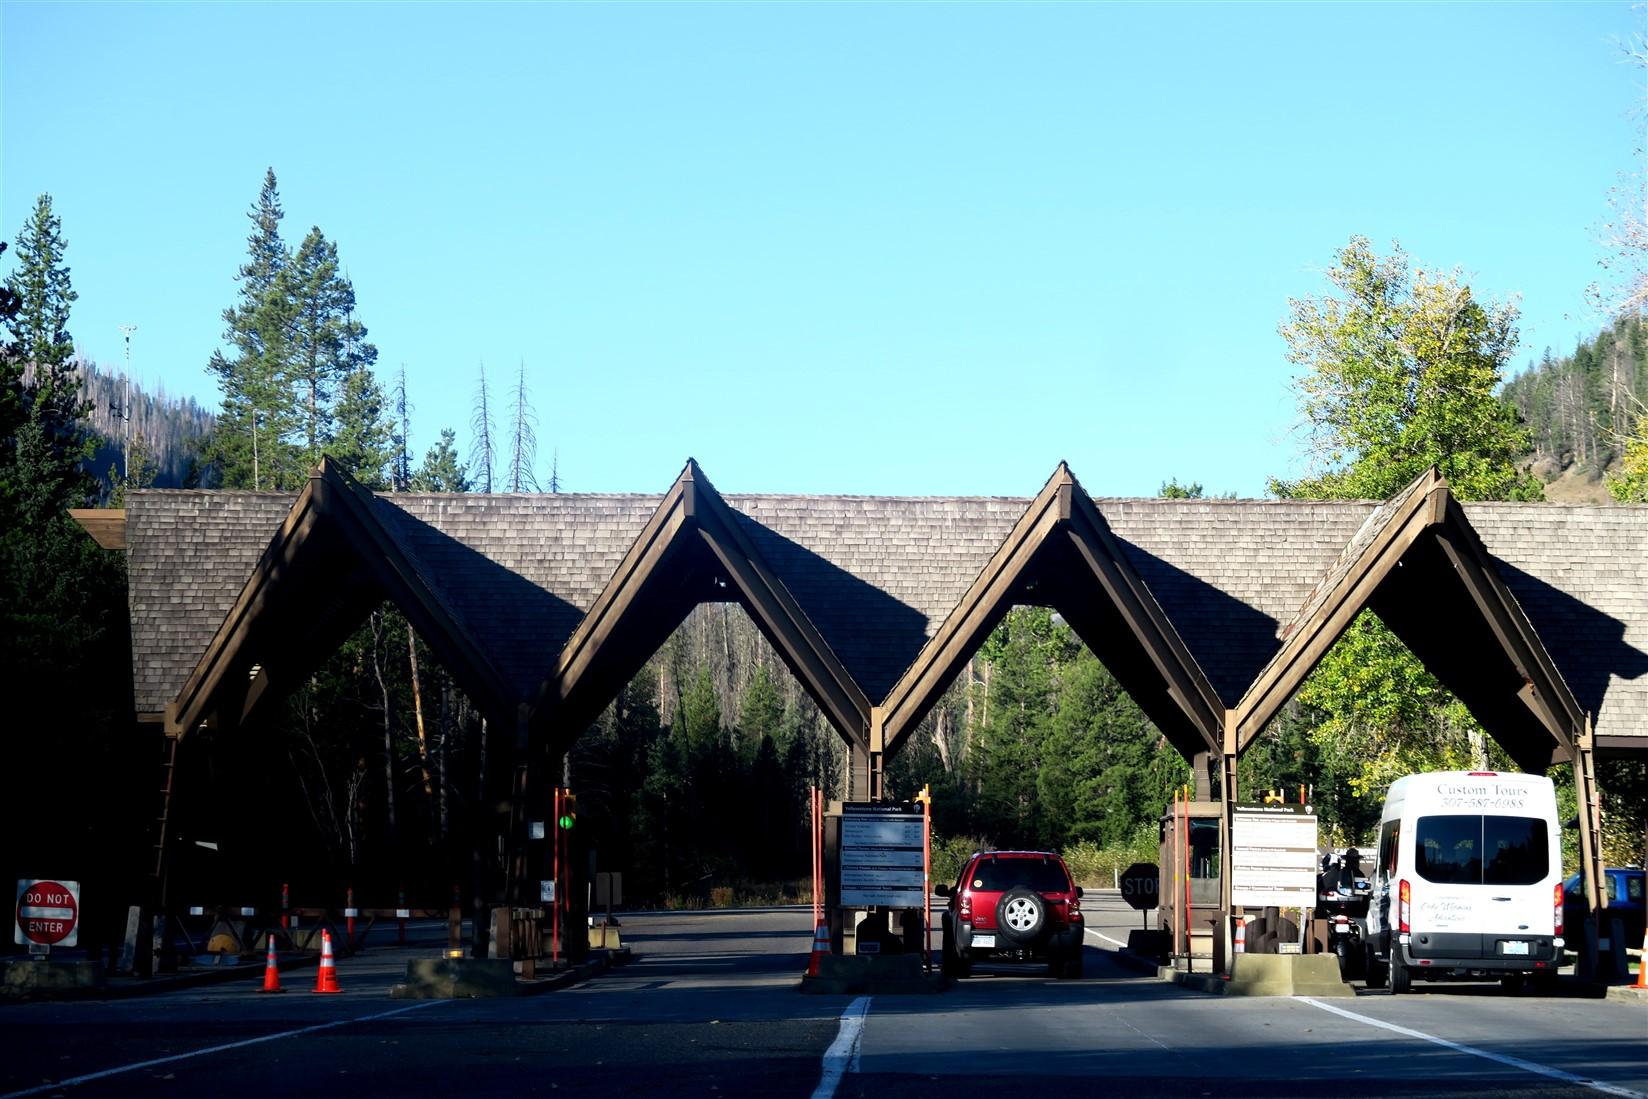 2015 09 11 24 Yellowstone National Park WY.jpg